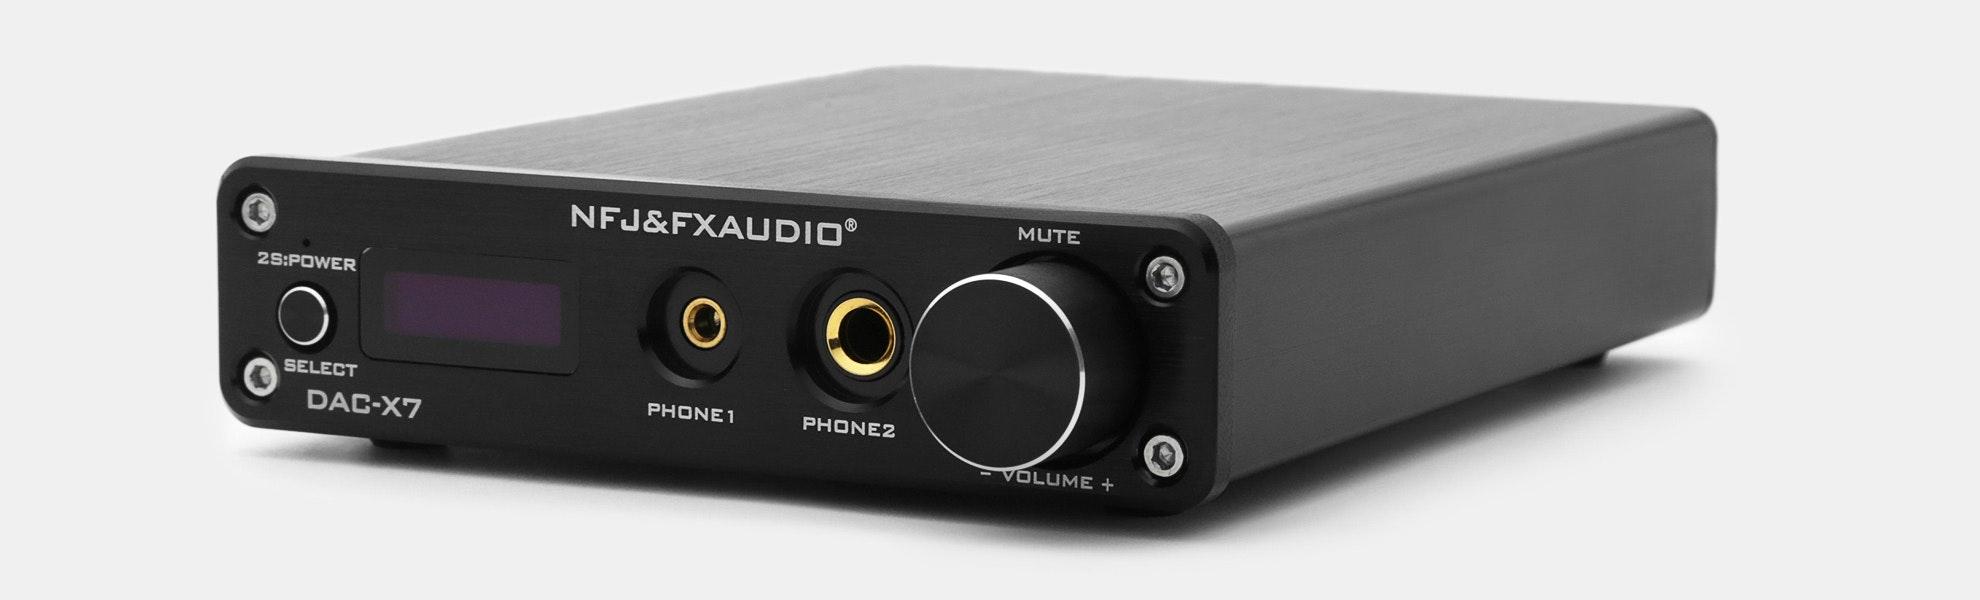 FX Audio DAC-X7 DAC/Amp